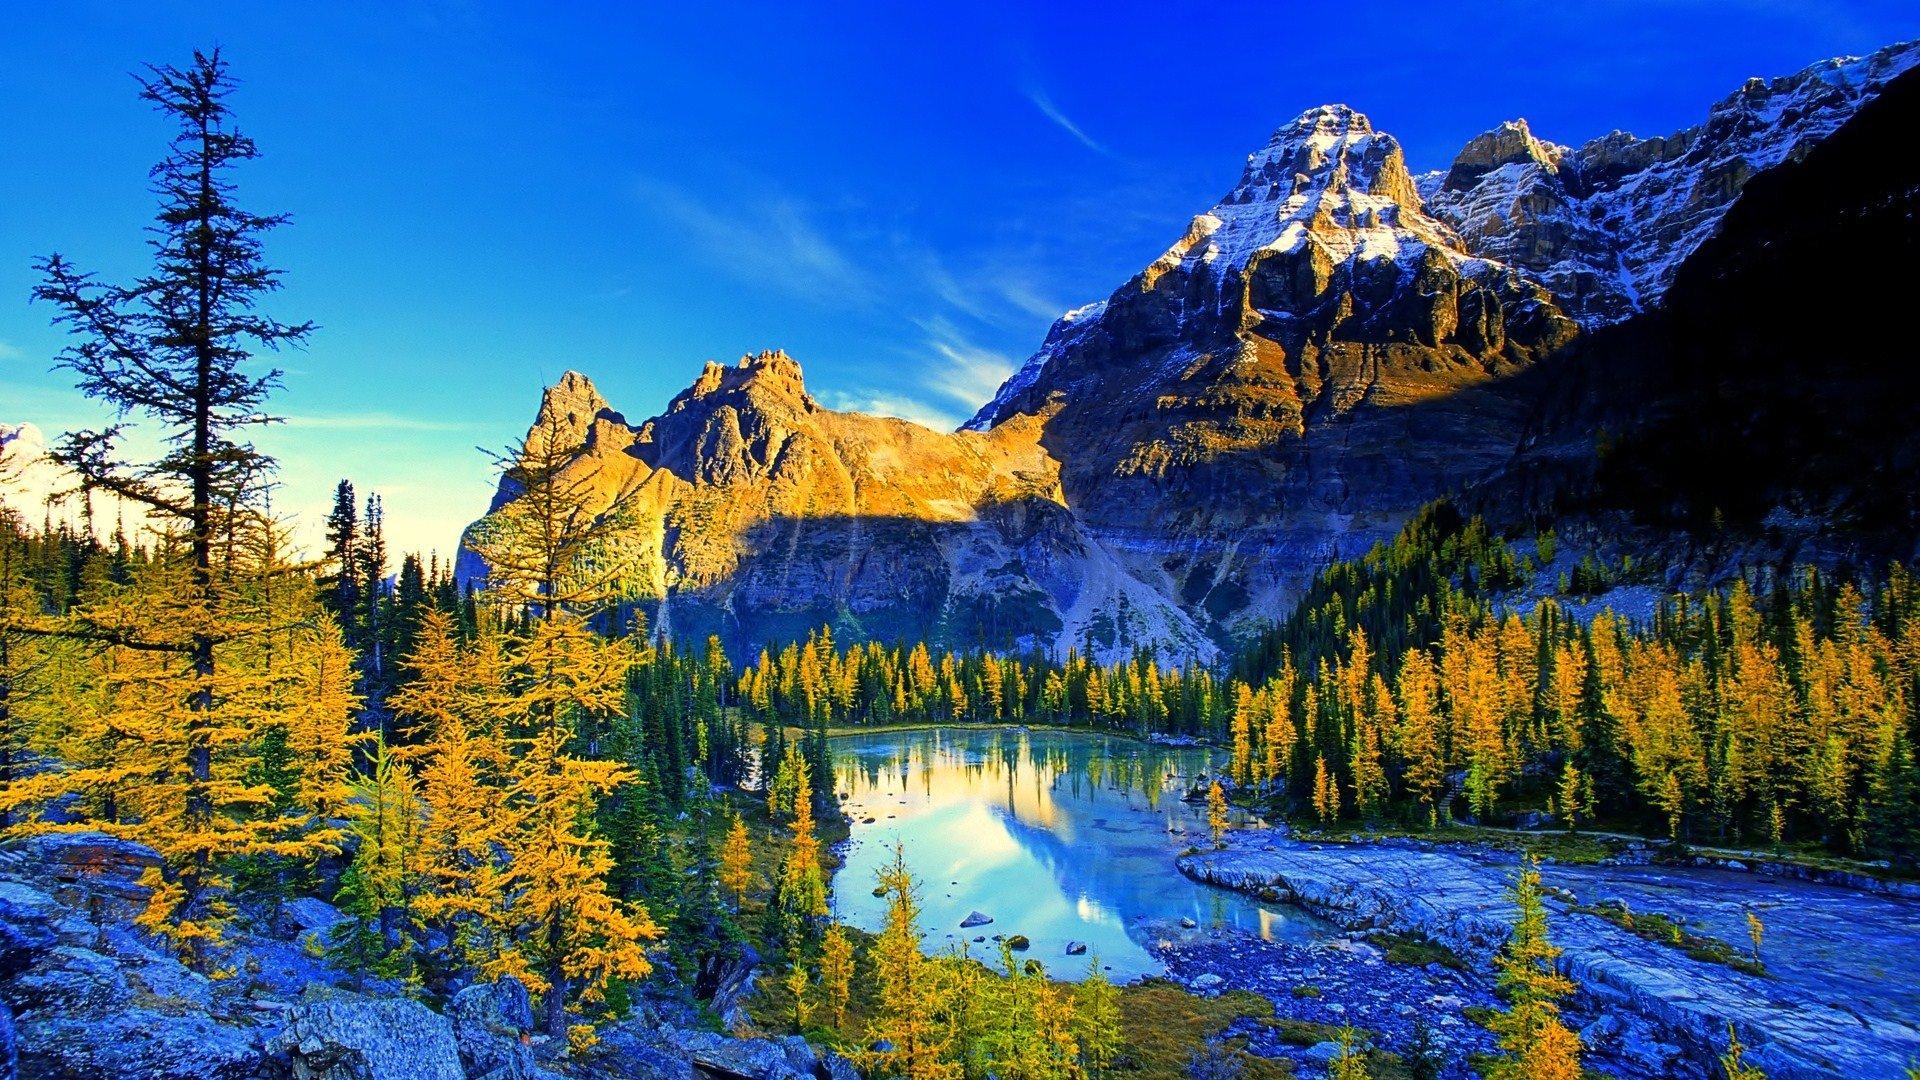 4k Hd Wallapaper: 4K Wallpaper Mountains